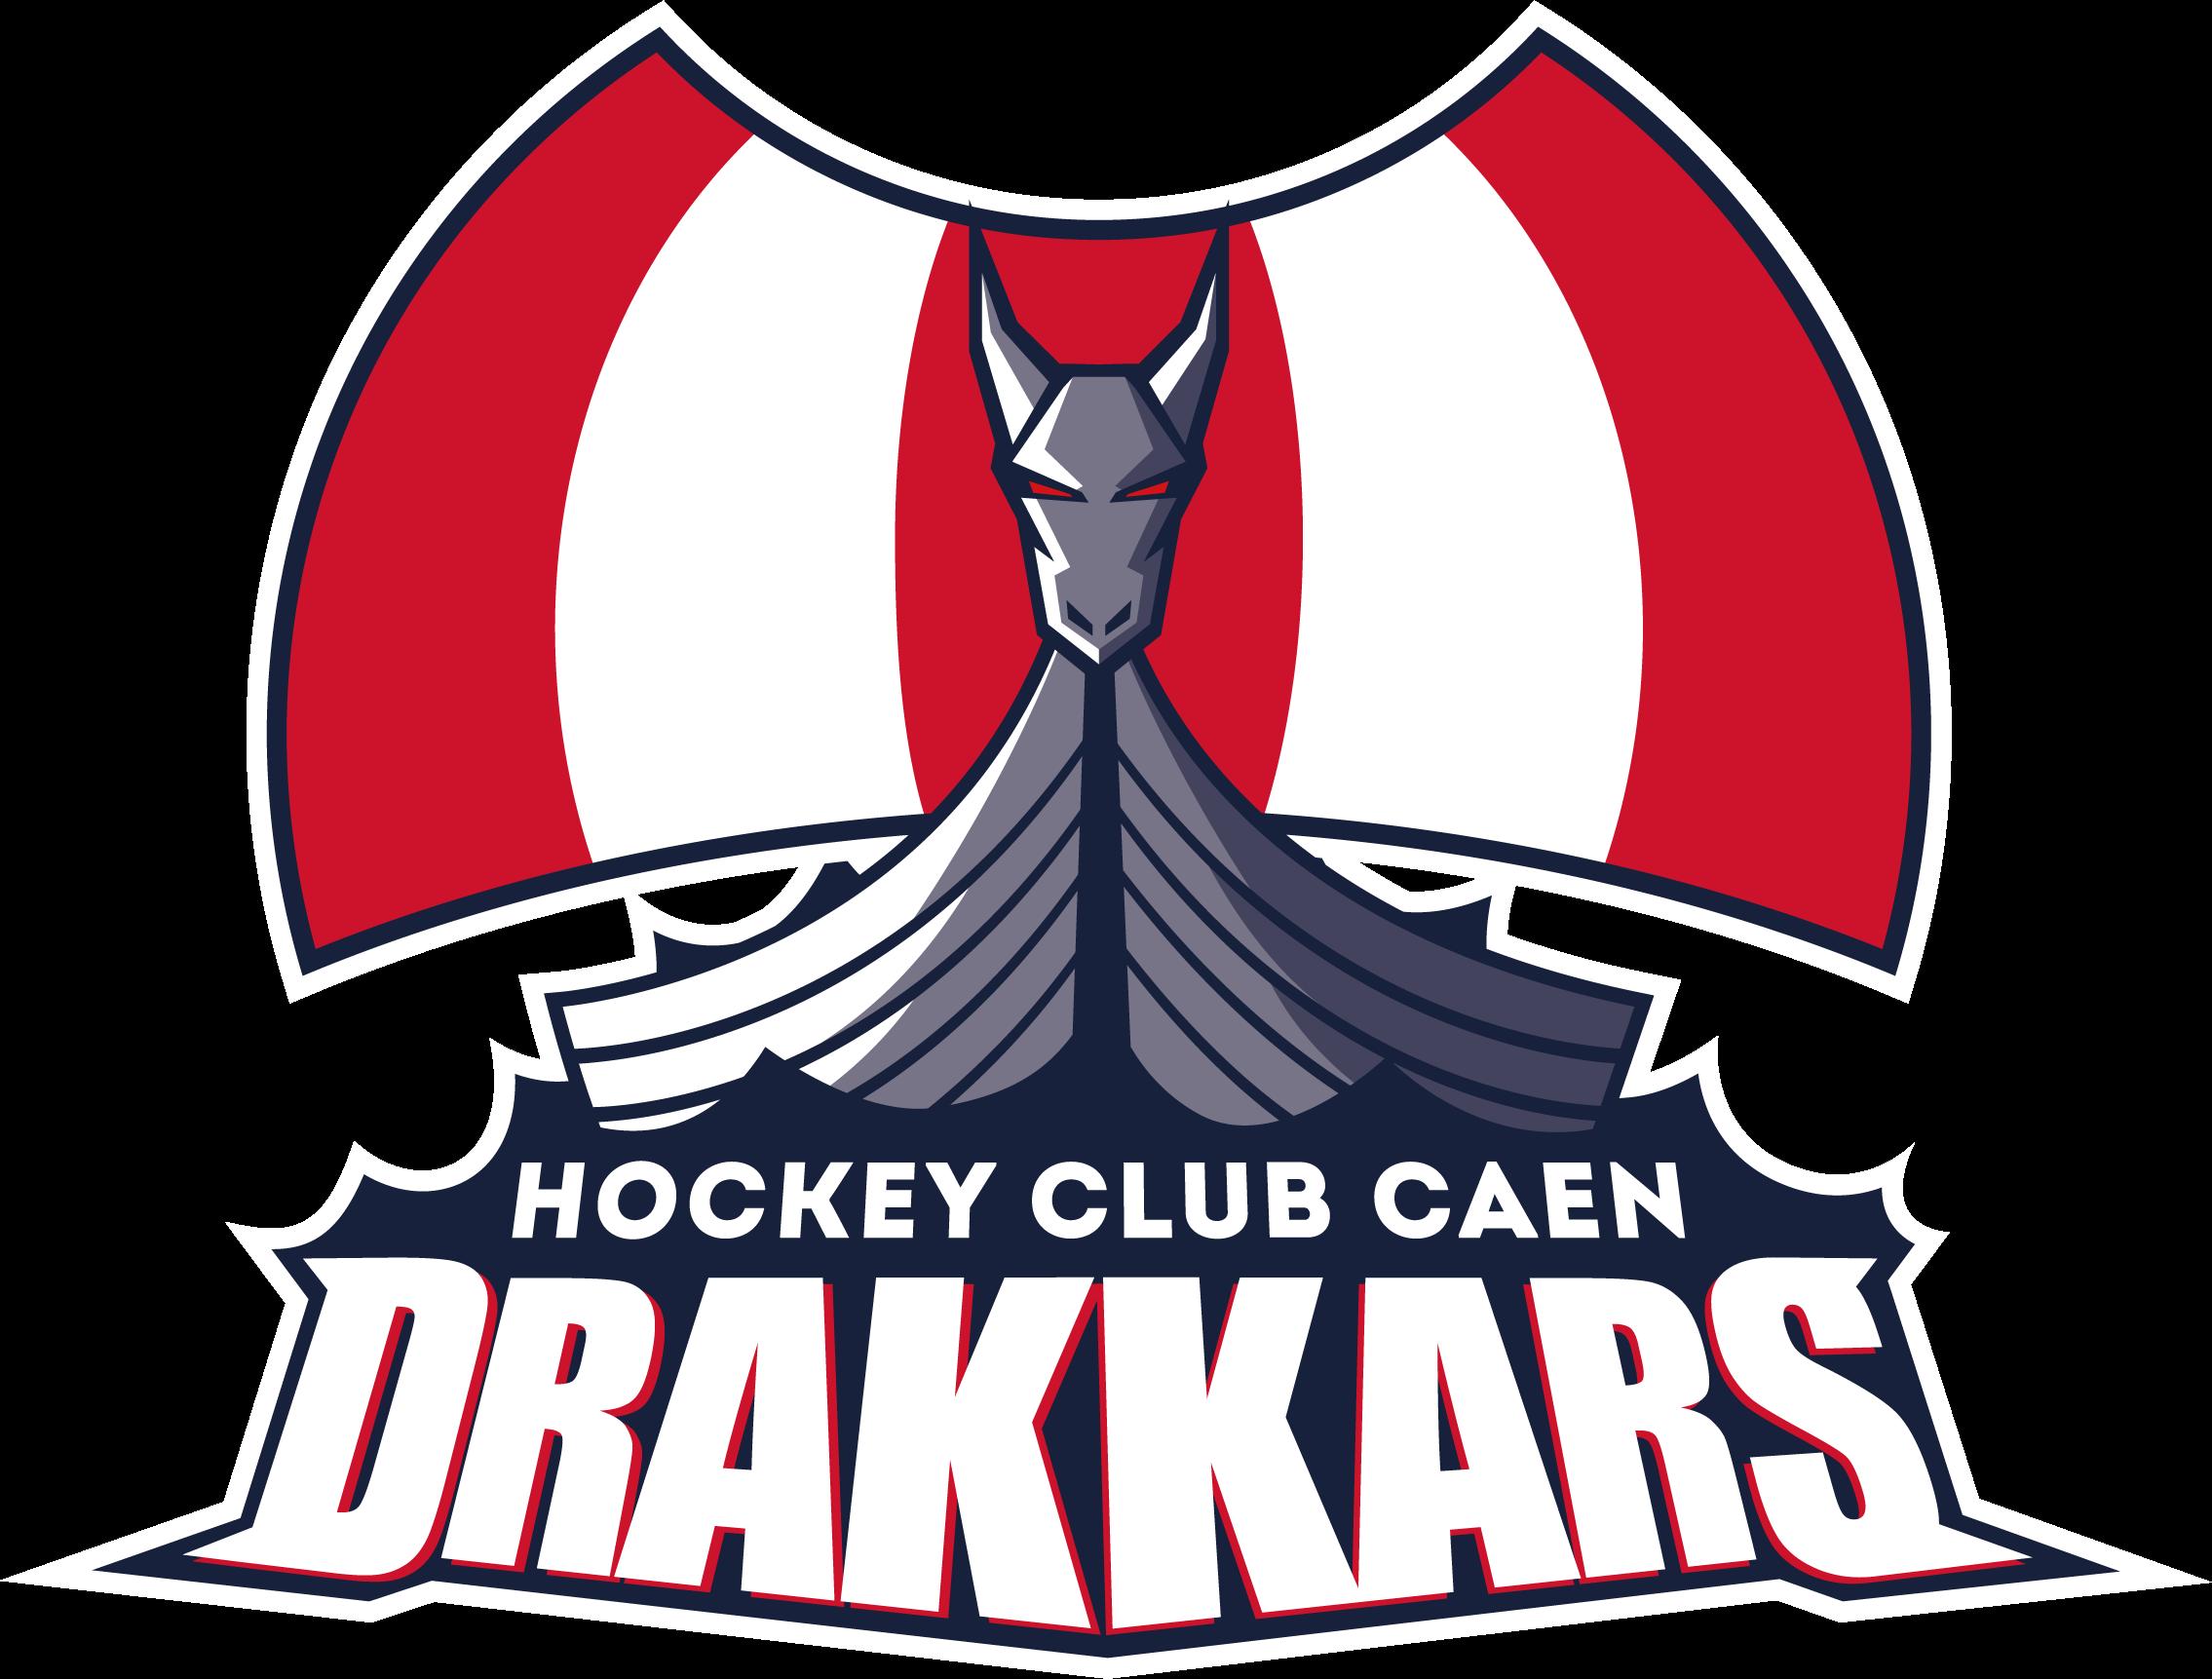 Drakkars hockey club Caen